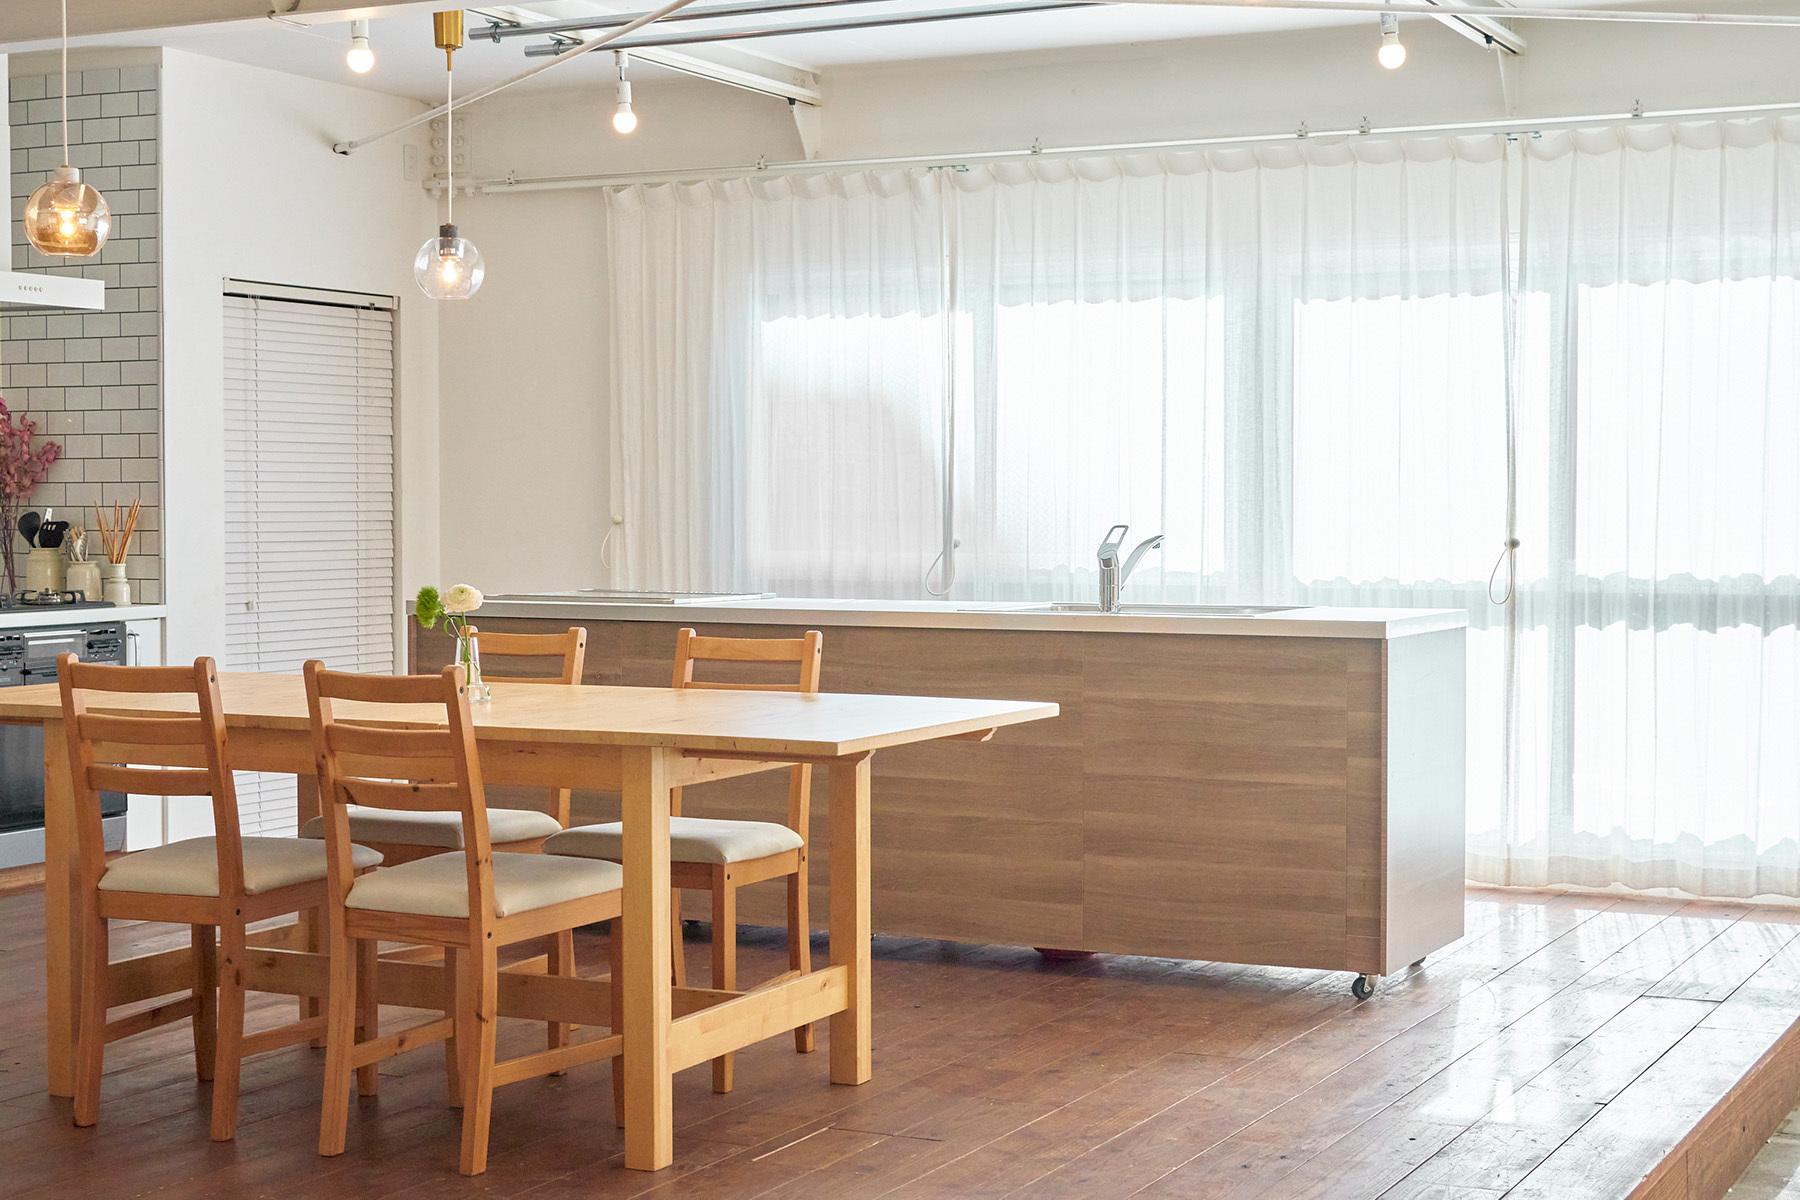 ACCA STUDIO (アッカスタジオ)3F/Cst 可動式のキッチン